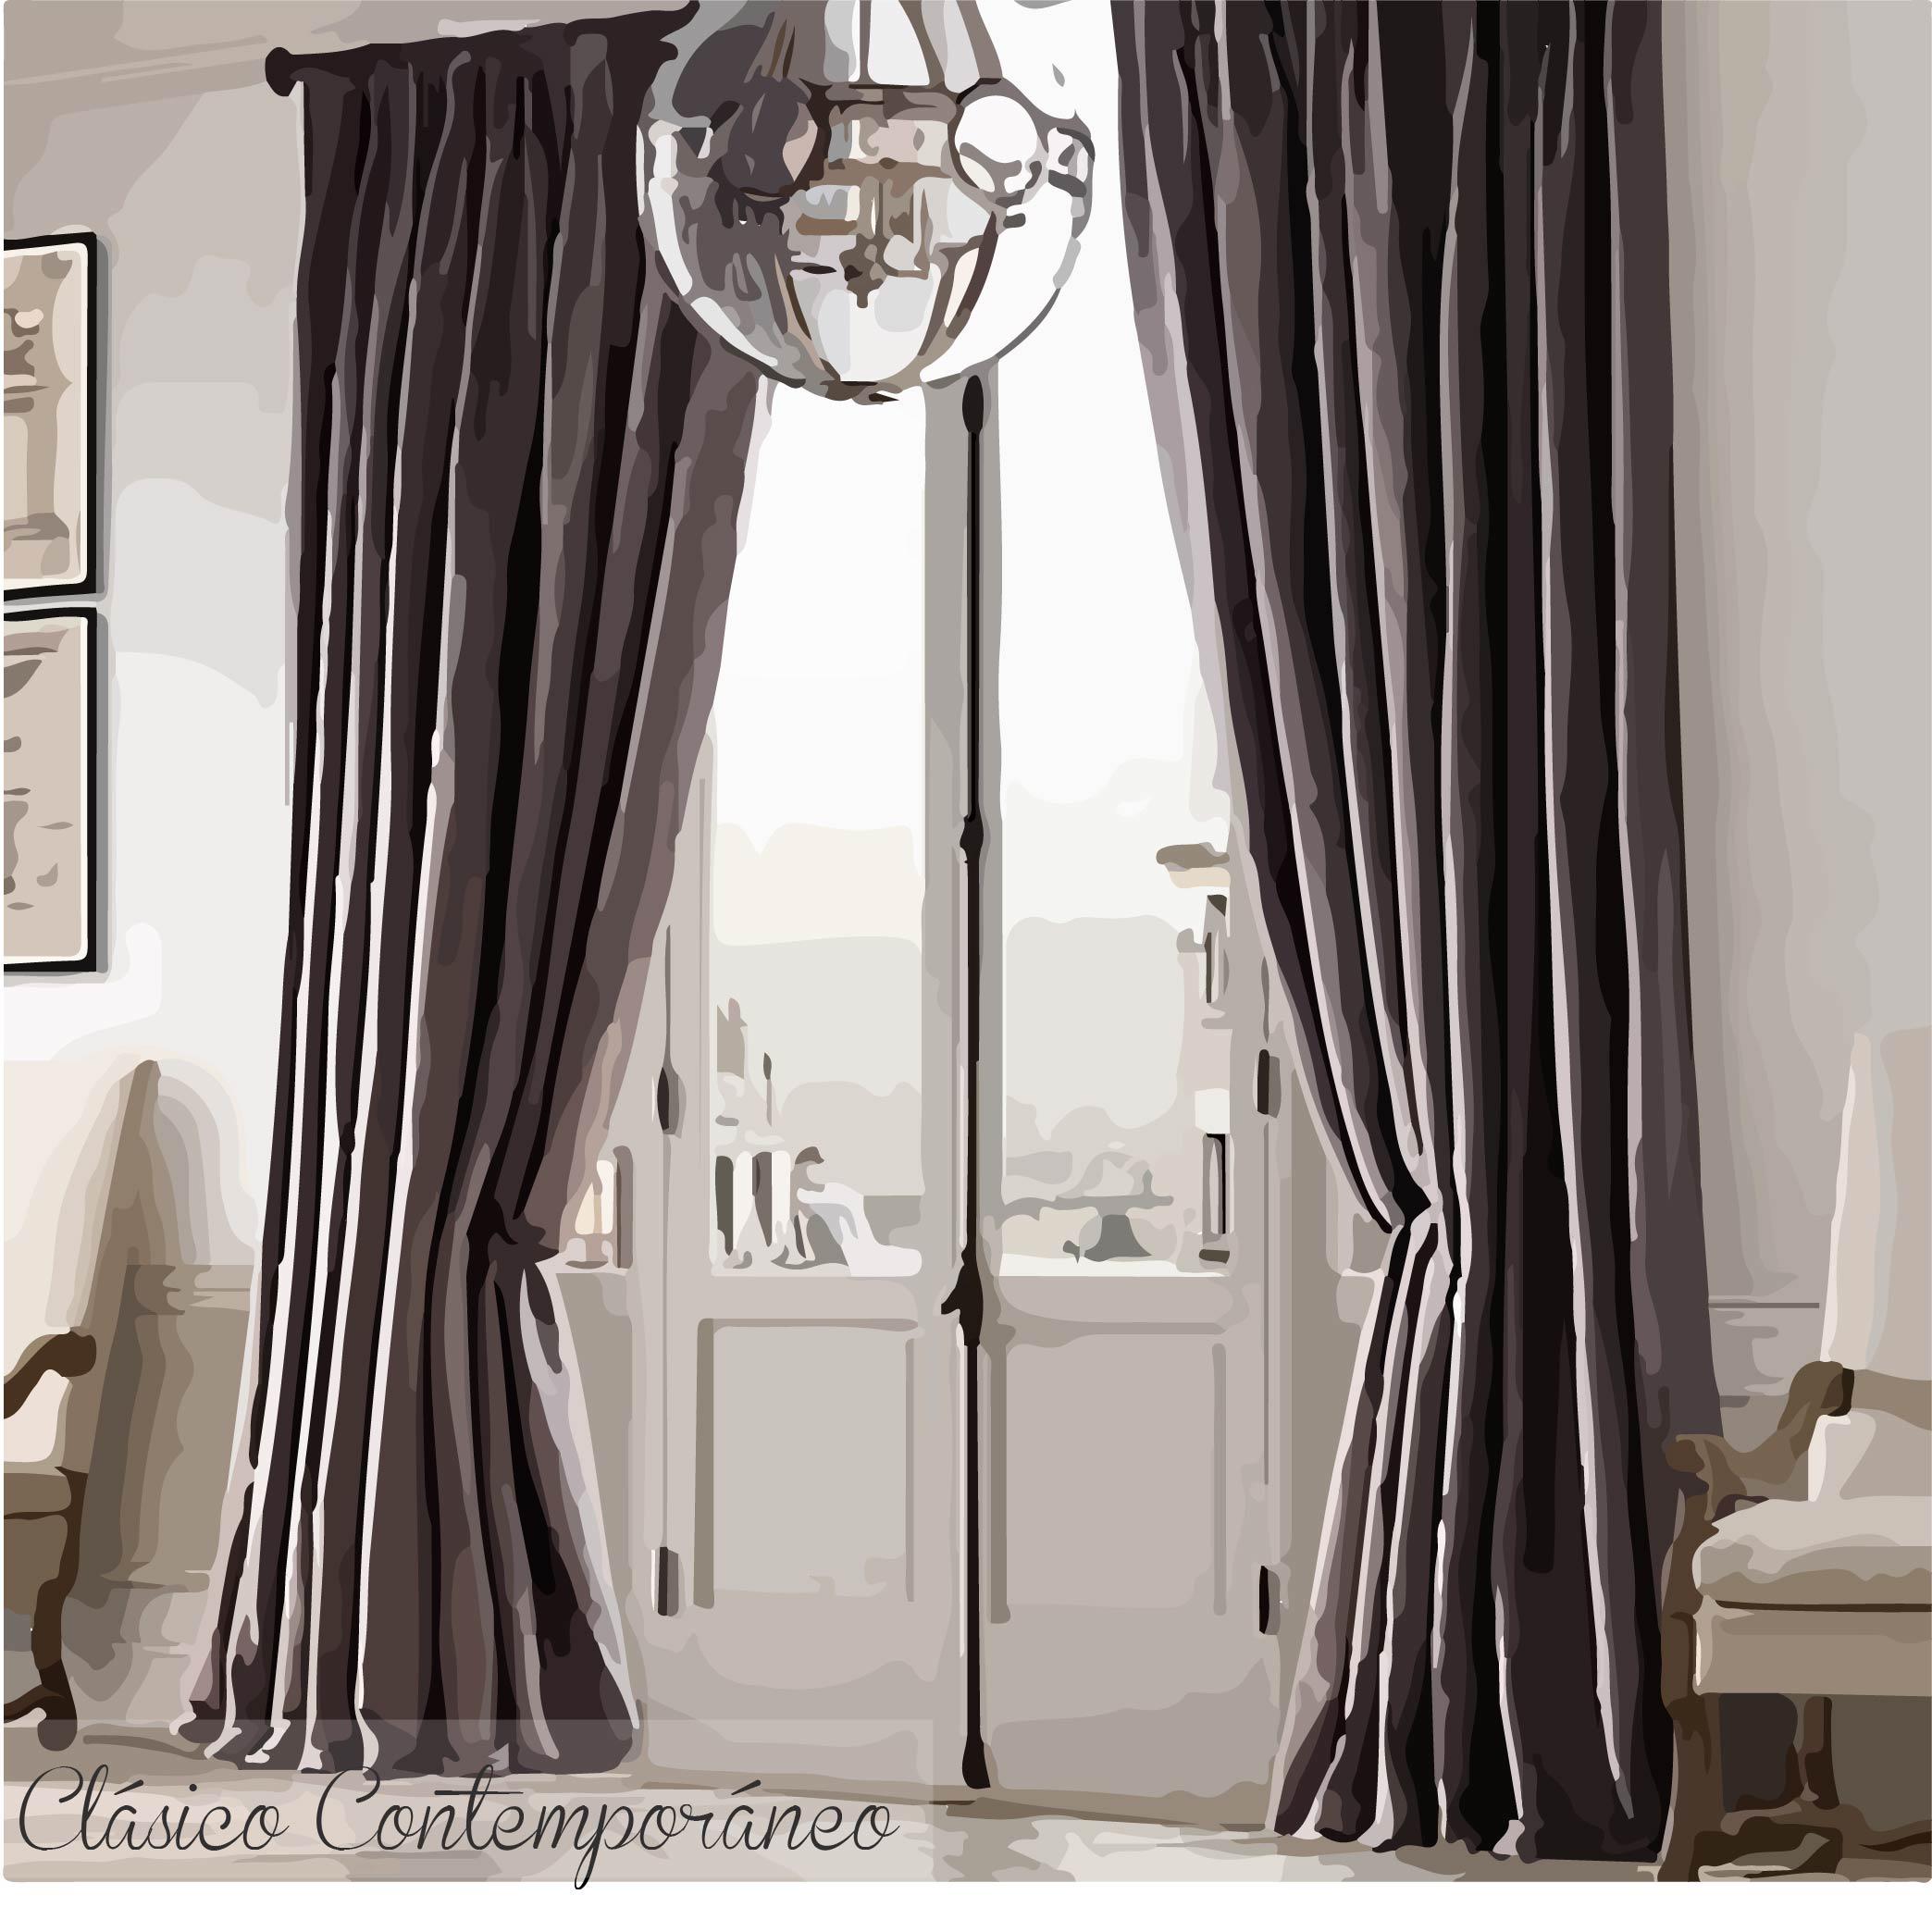 Moda cortinas de moda de lujo de estilo opacas cortinas for Estilos de cortinas